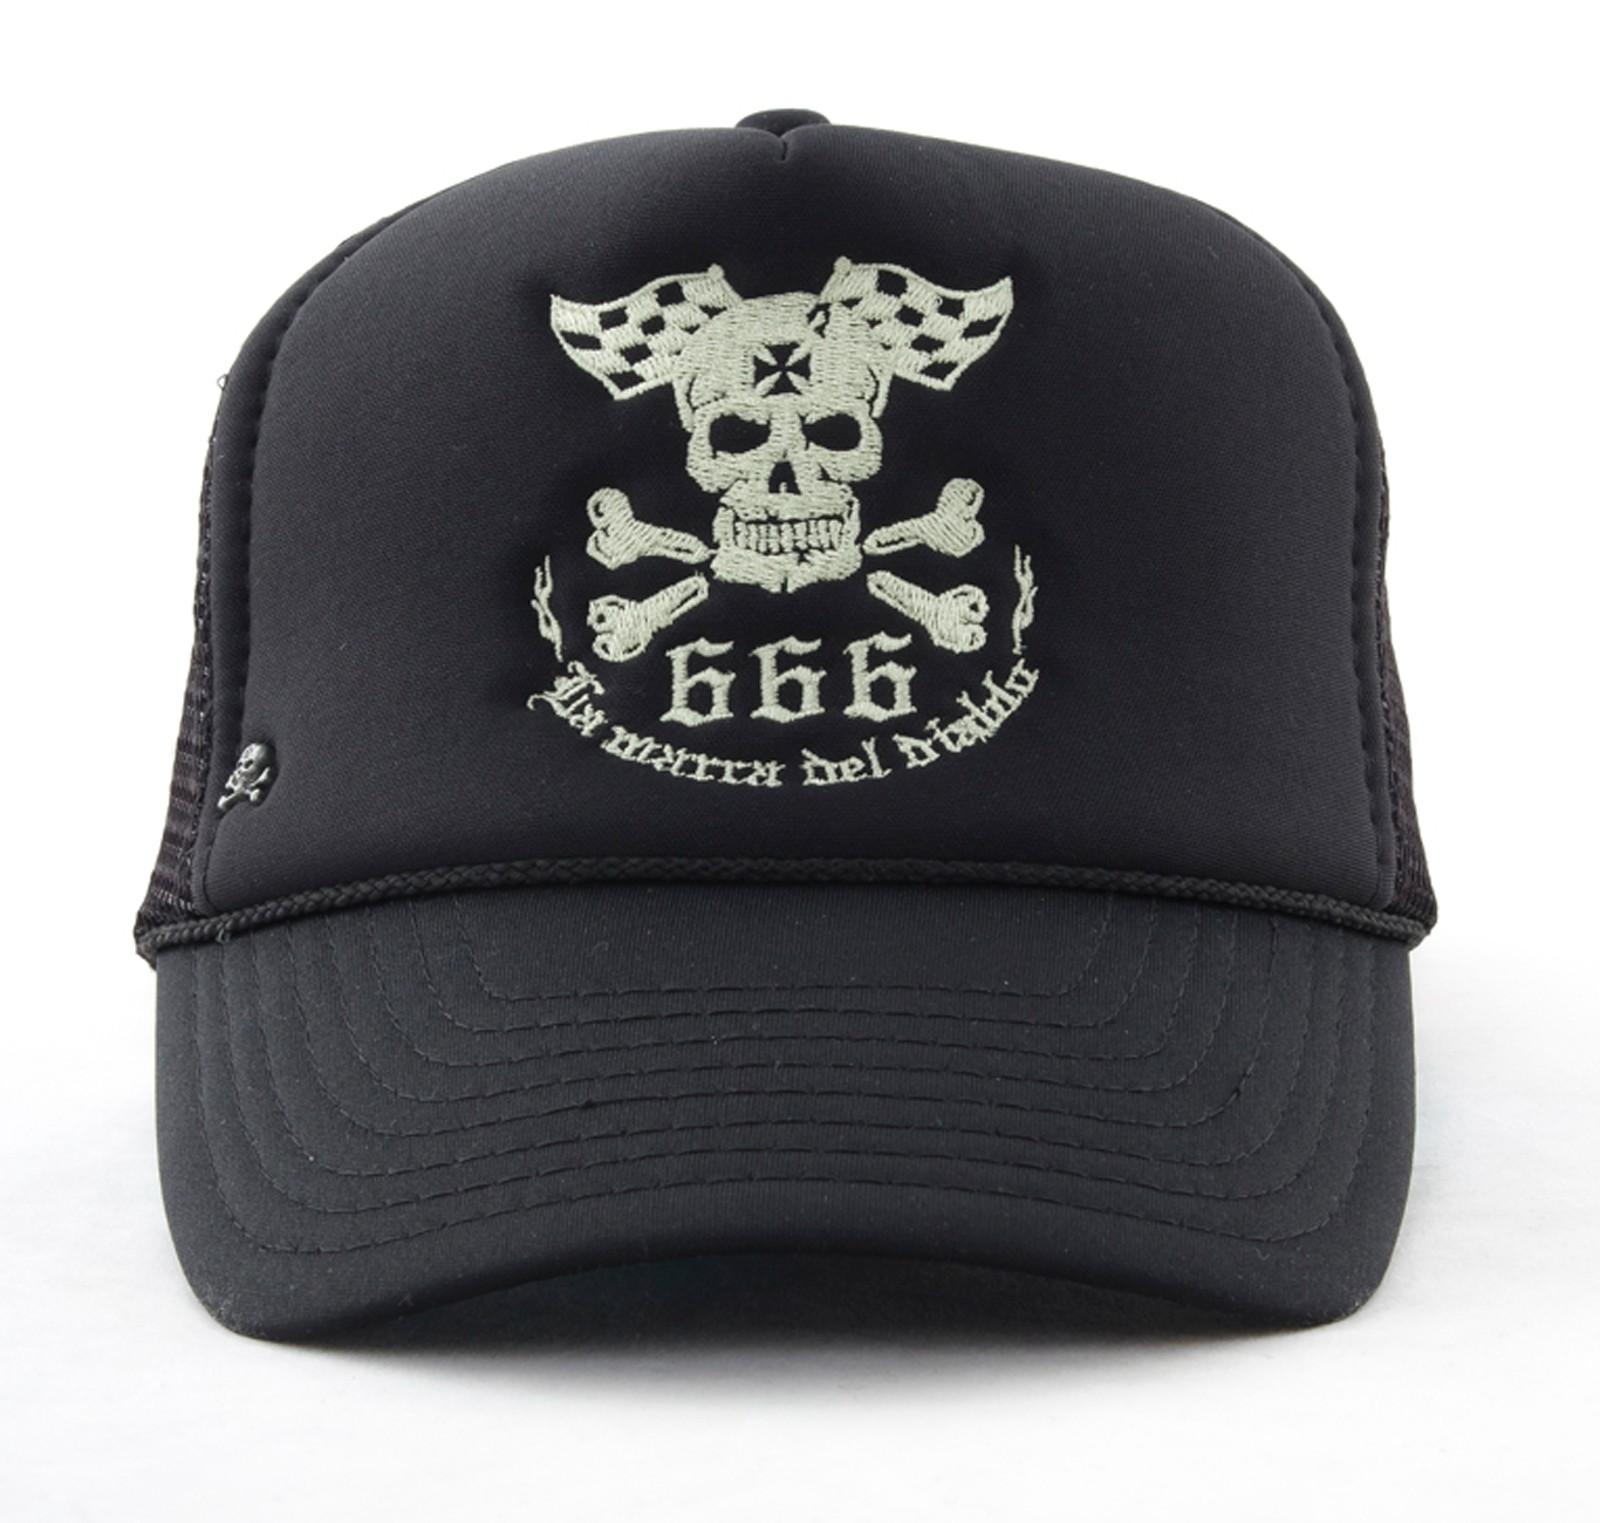 La Marca Del Diablo - Logo Skull Trucker Cap